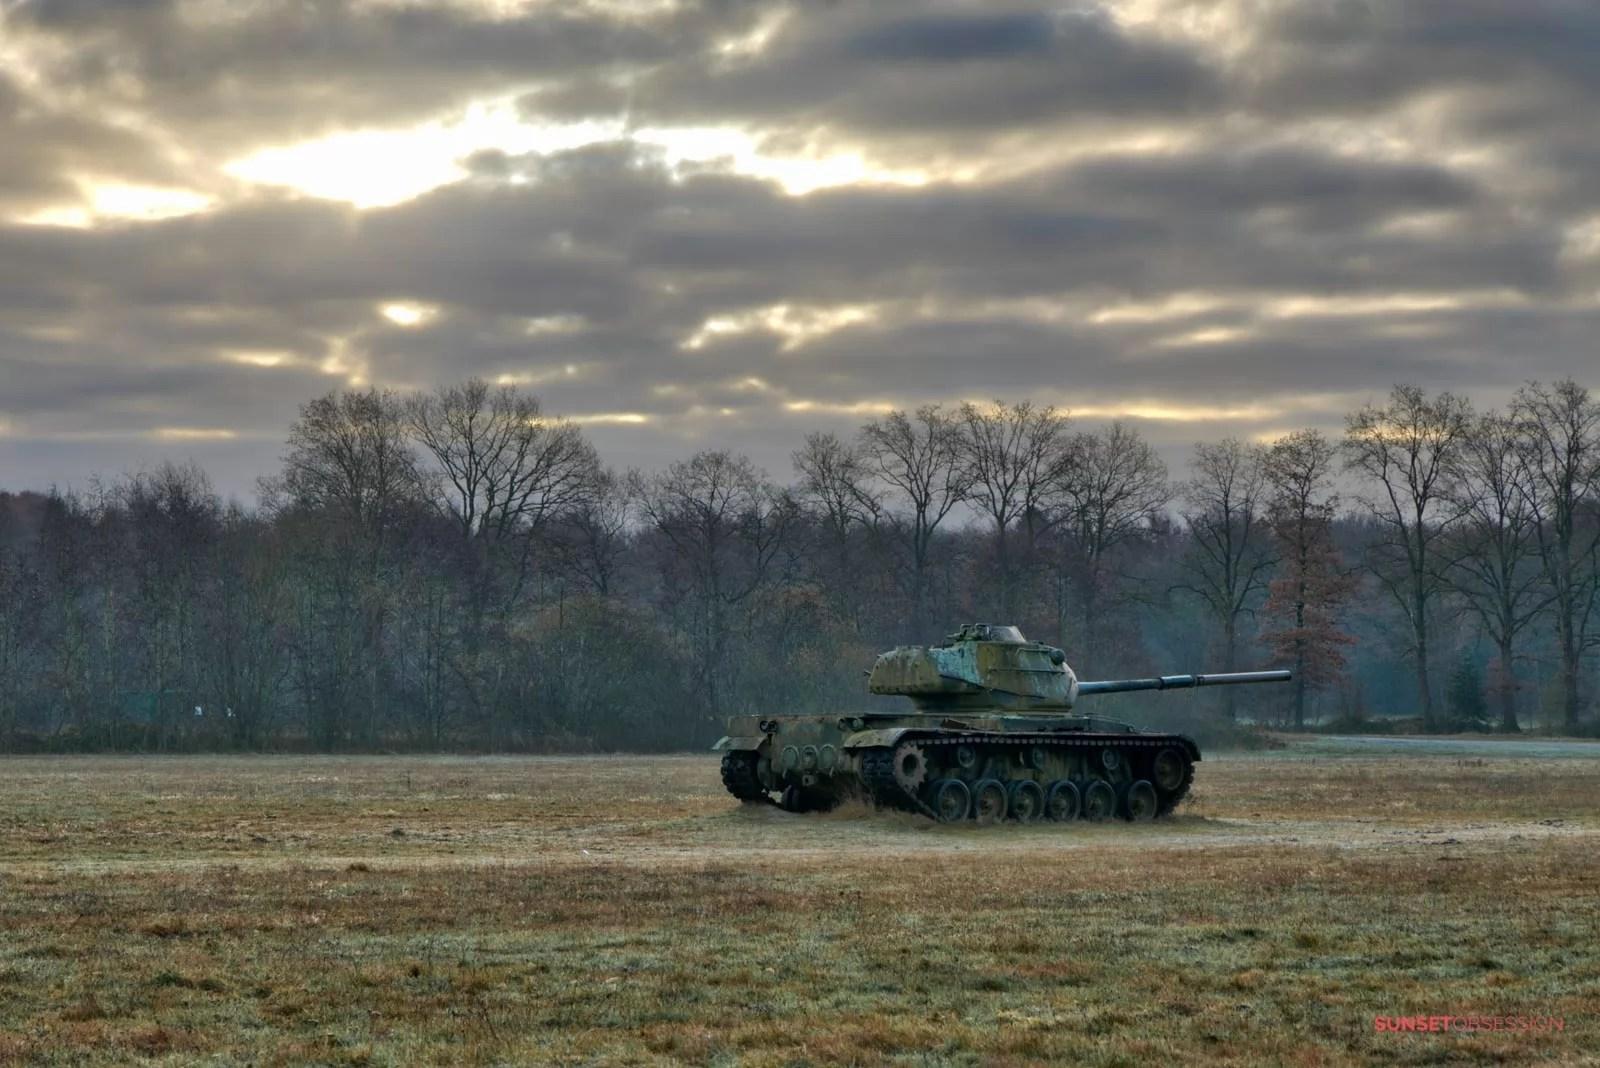 Gloomy winter skies above the war machines